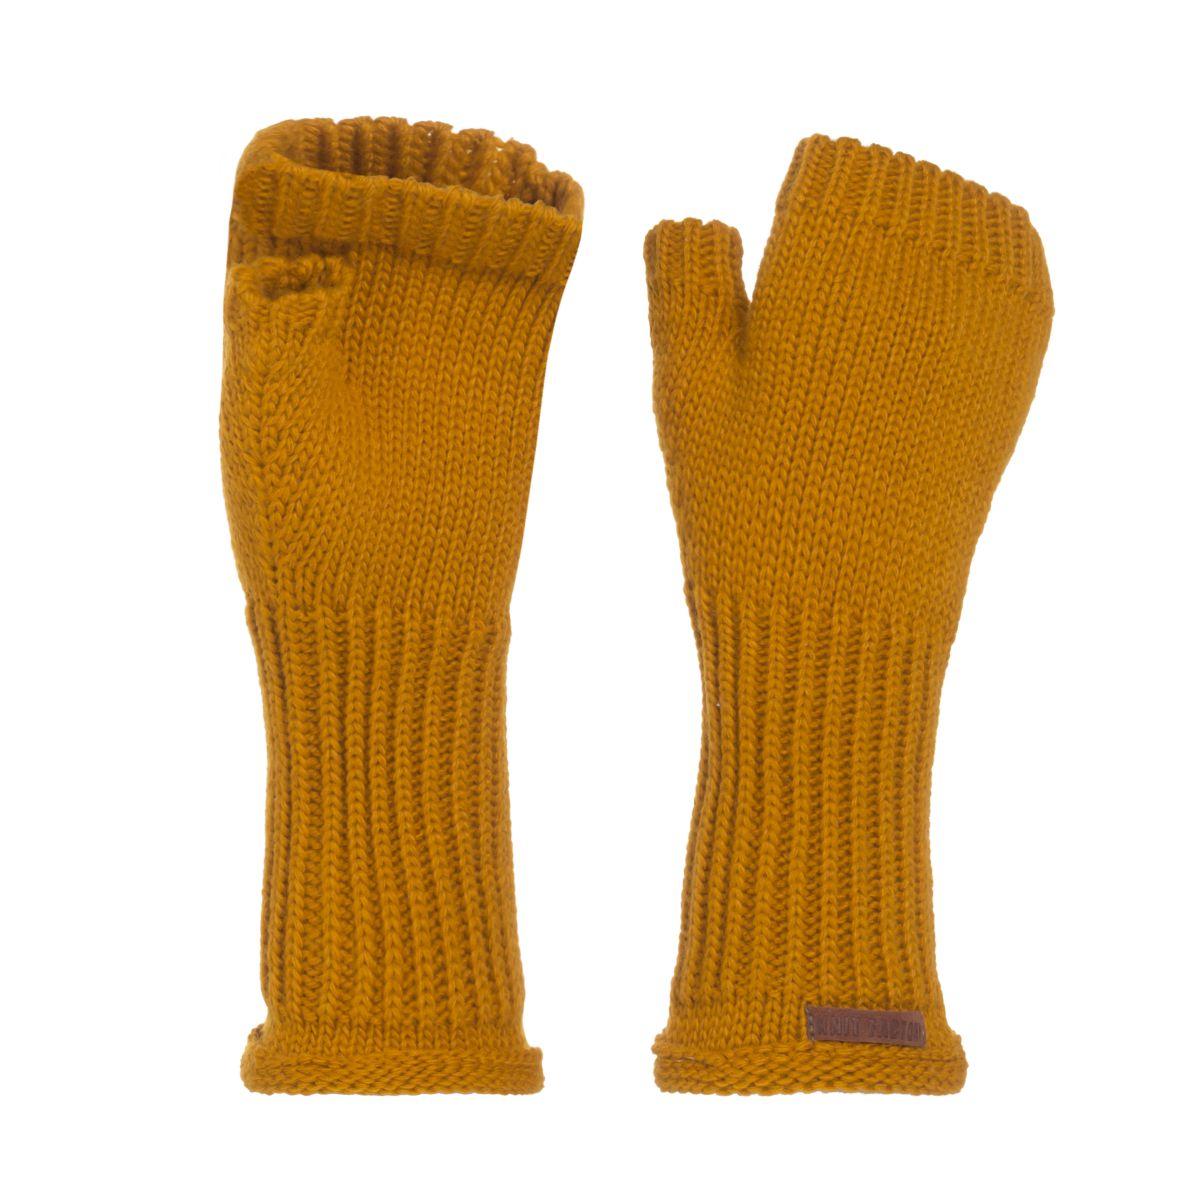 cleo gloves ochre